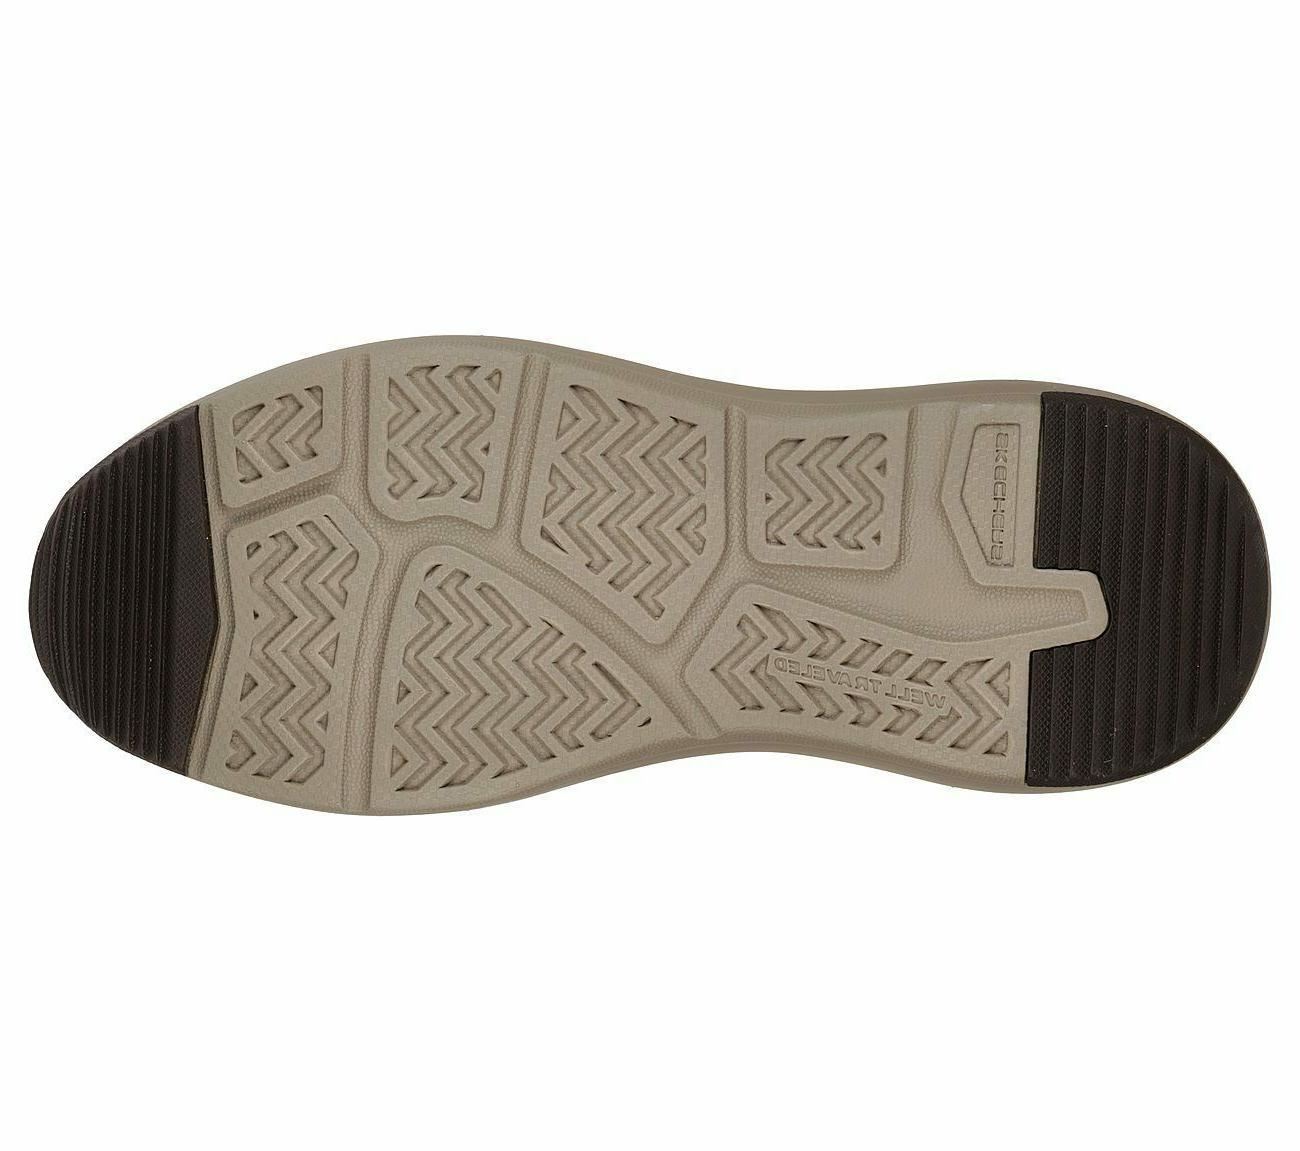 Skechers shoes Memory Foam Comfort